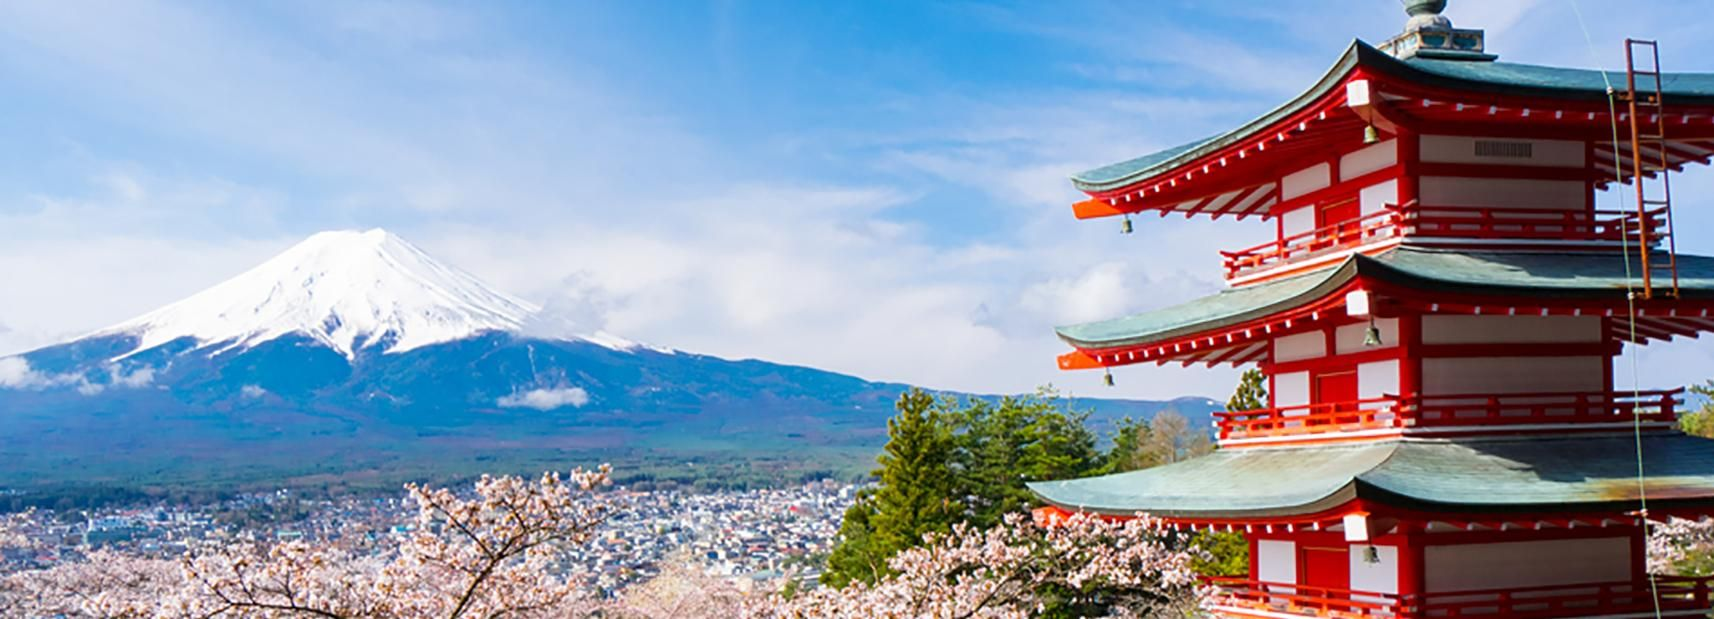 Mt Fuji Day Tour With Kawaguchiko Lake Tokyo Japan Getyourguide